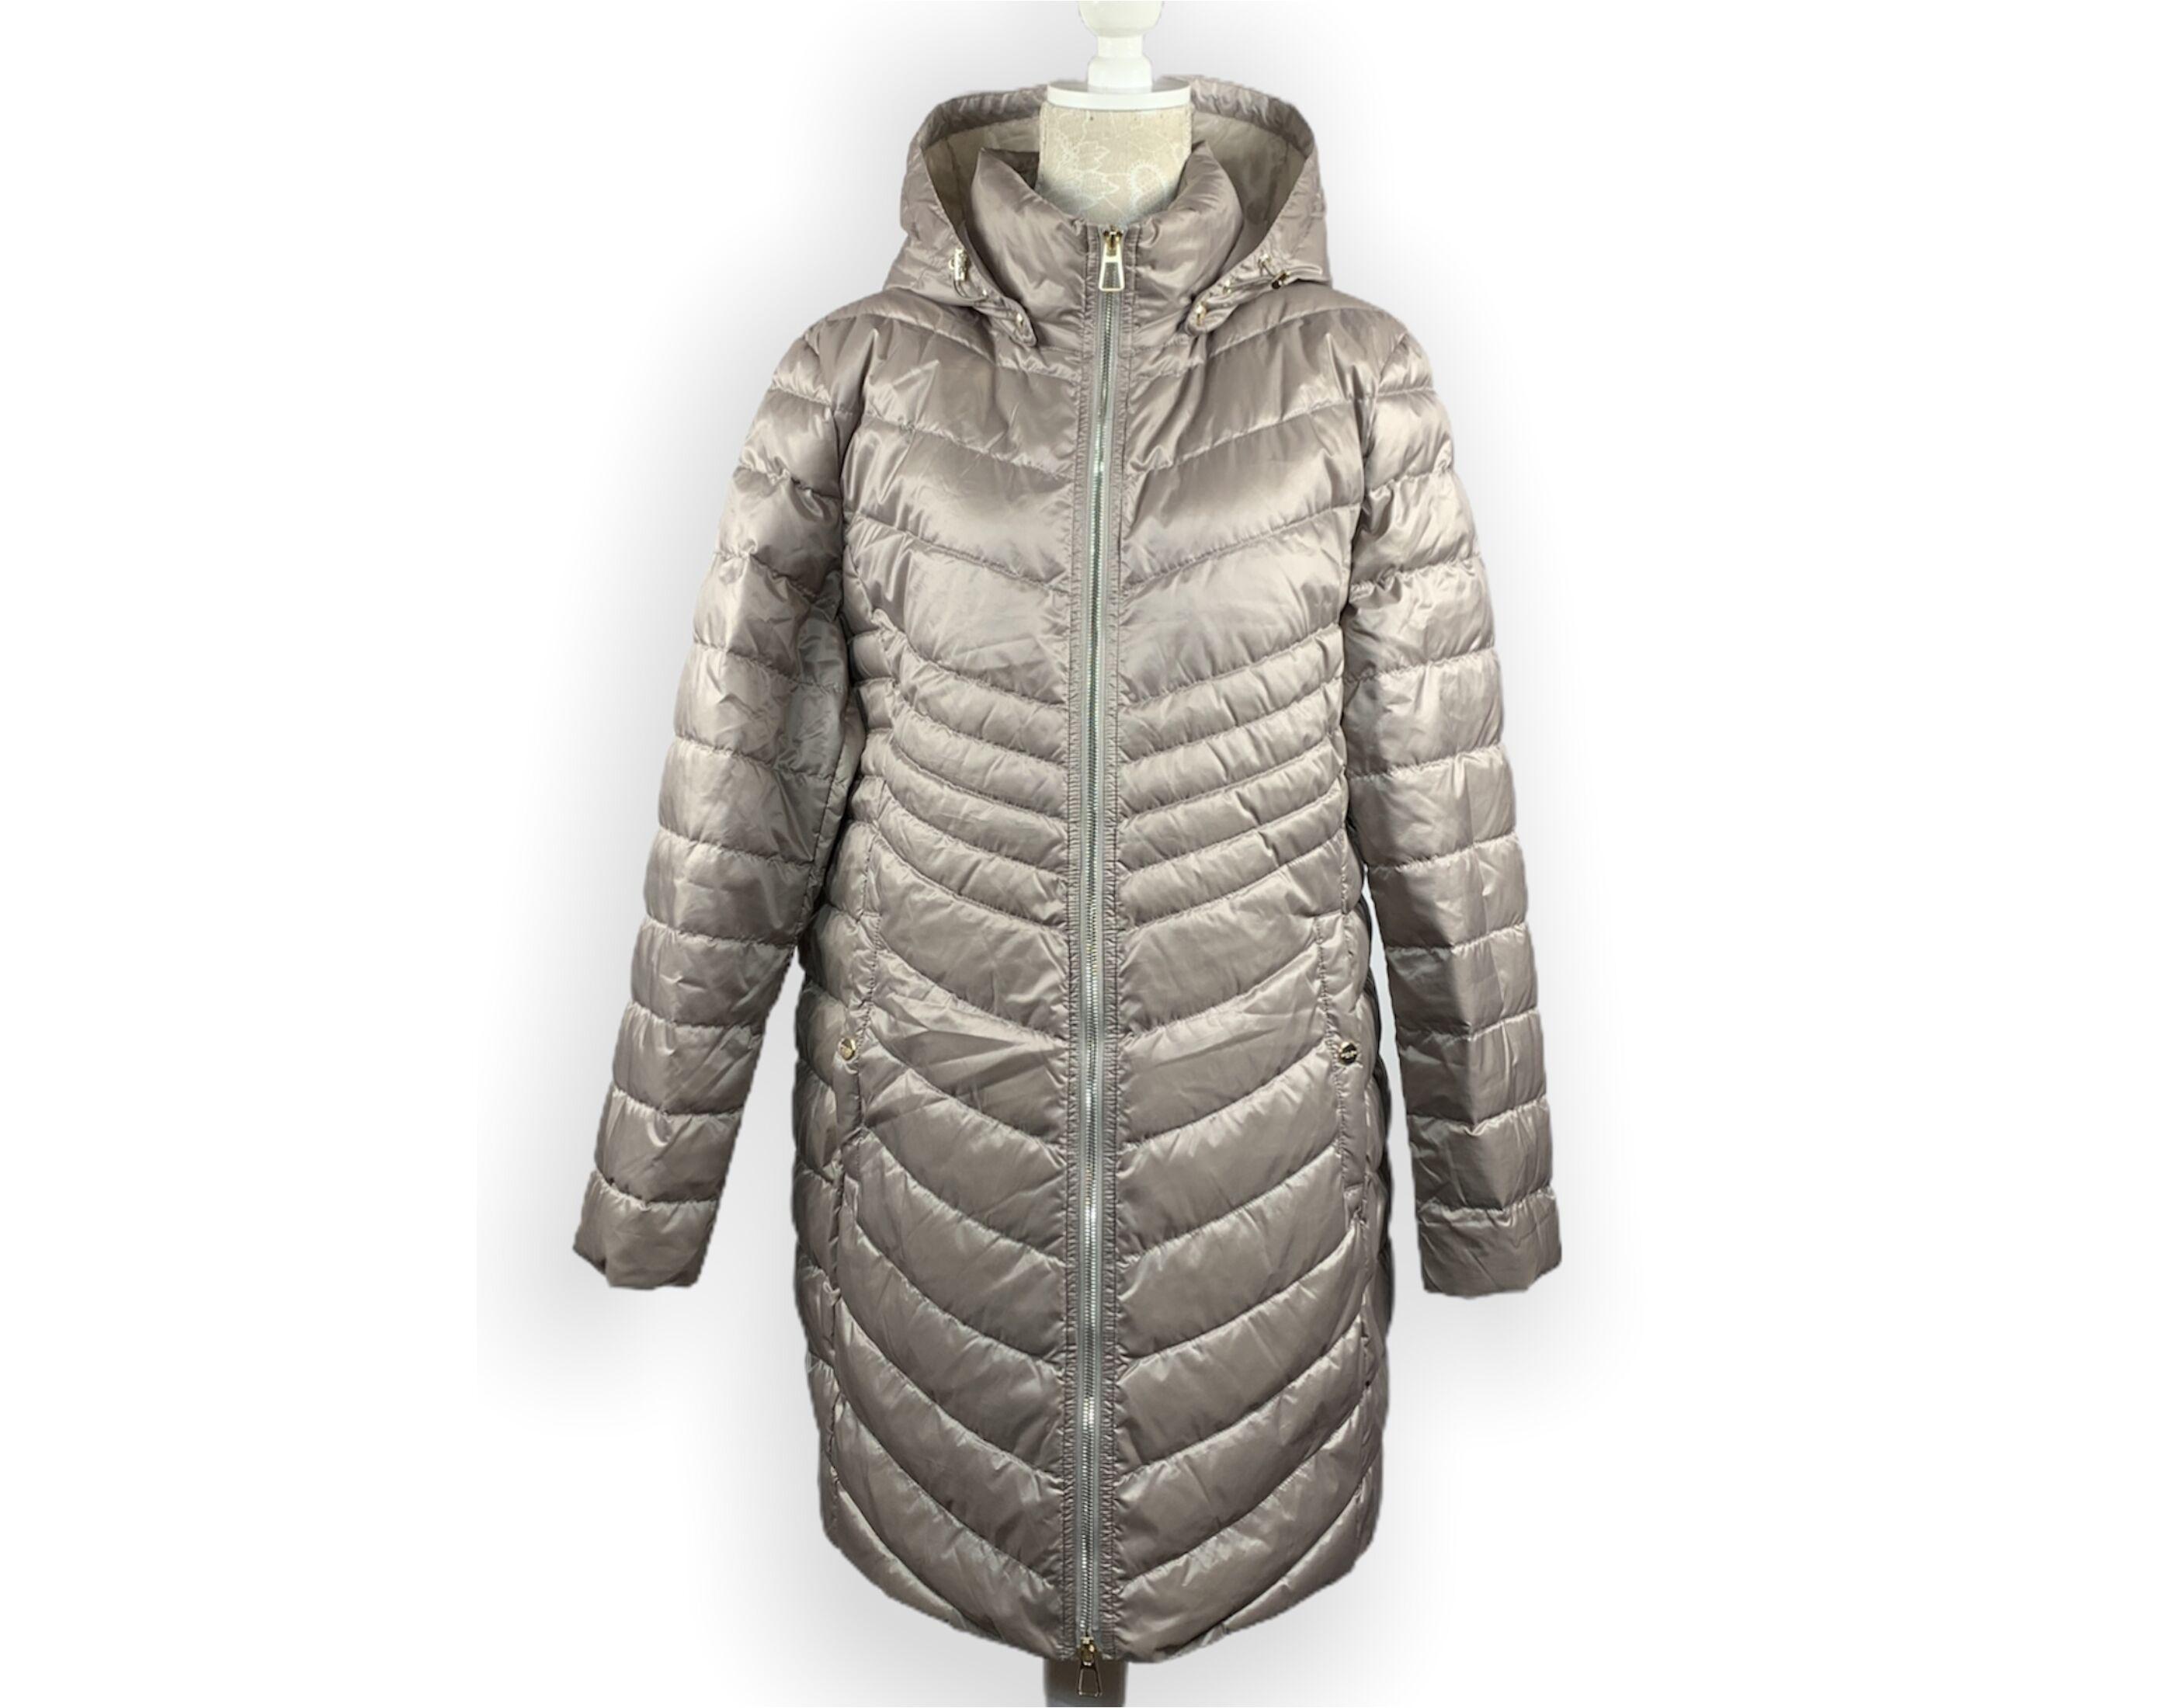 Christian Berg kabát (XL)